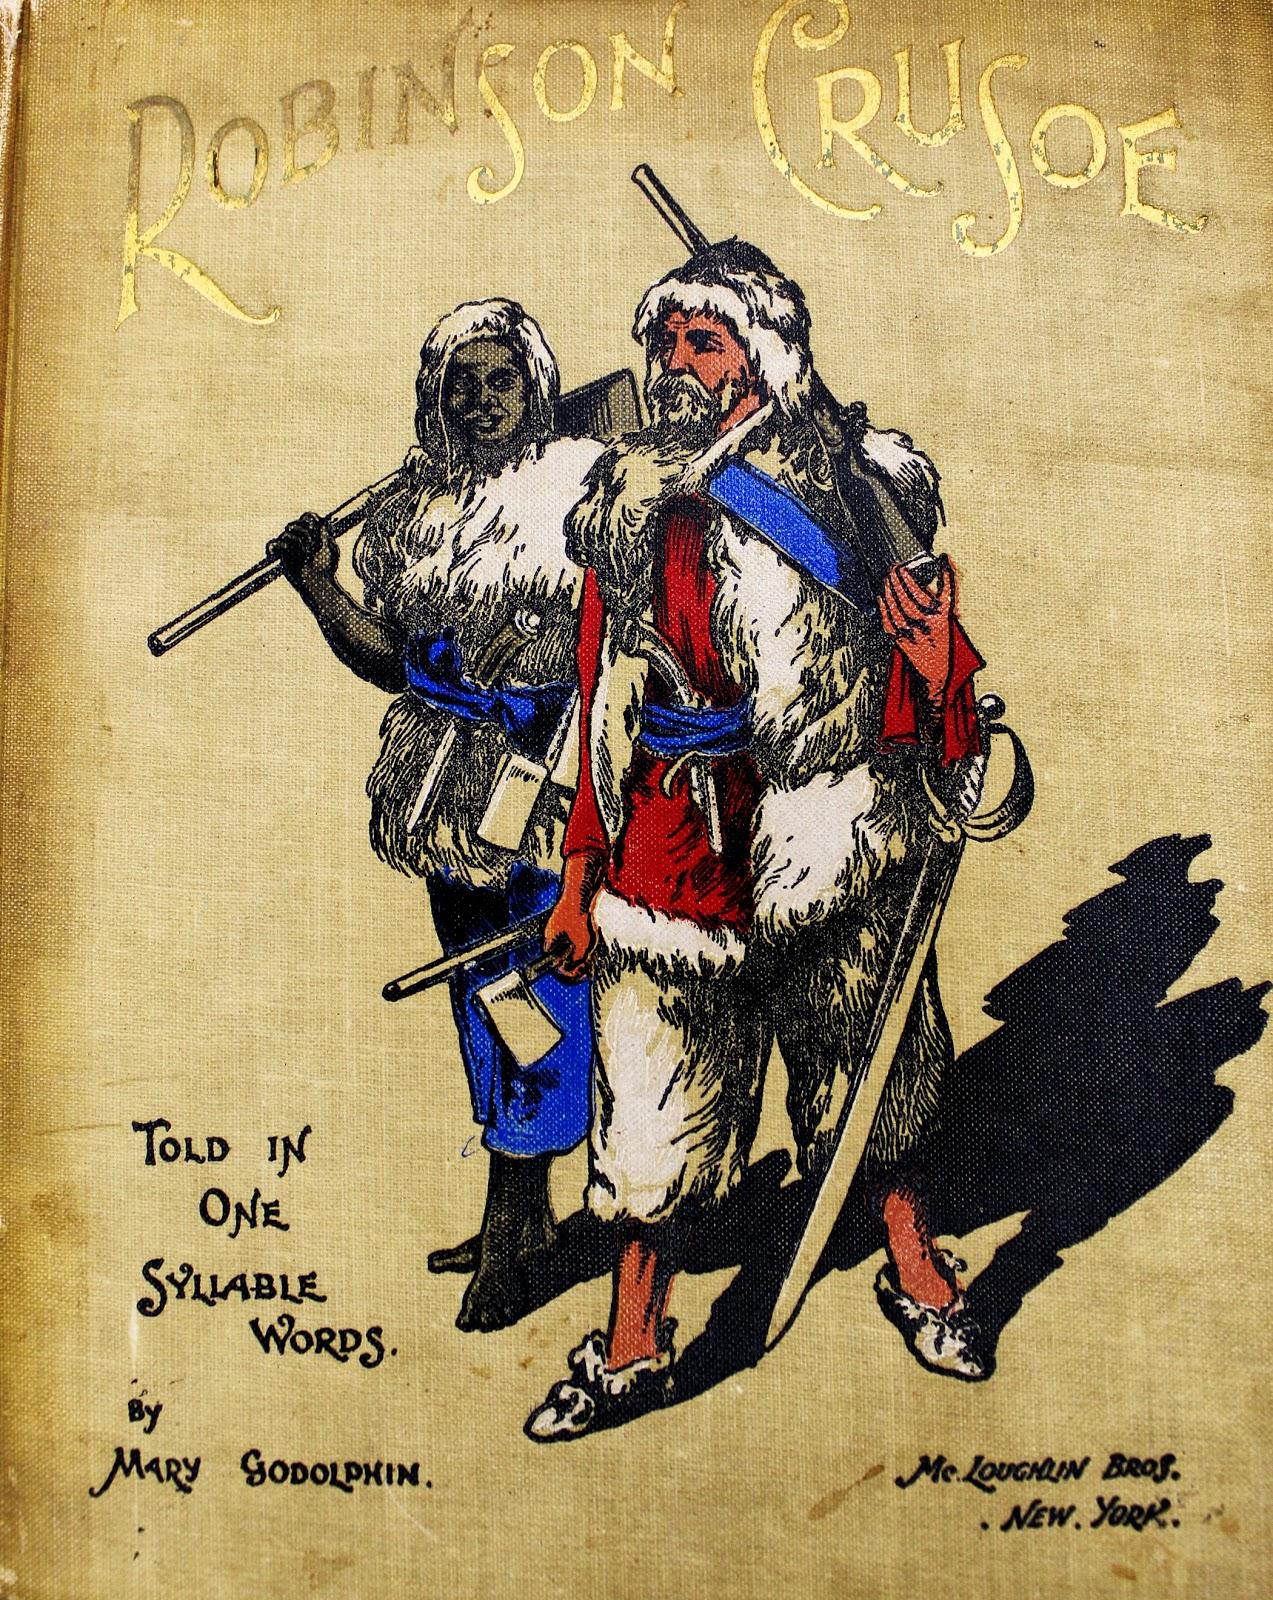 robinson crusoe unreliable narrators Books with unreliable narrators description: don't trust the narrator in these books members: 38 participating members  all members: ncgraham.